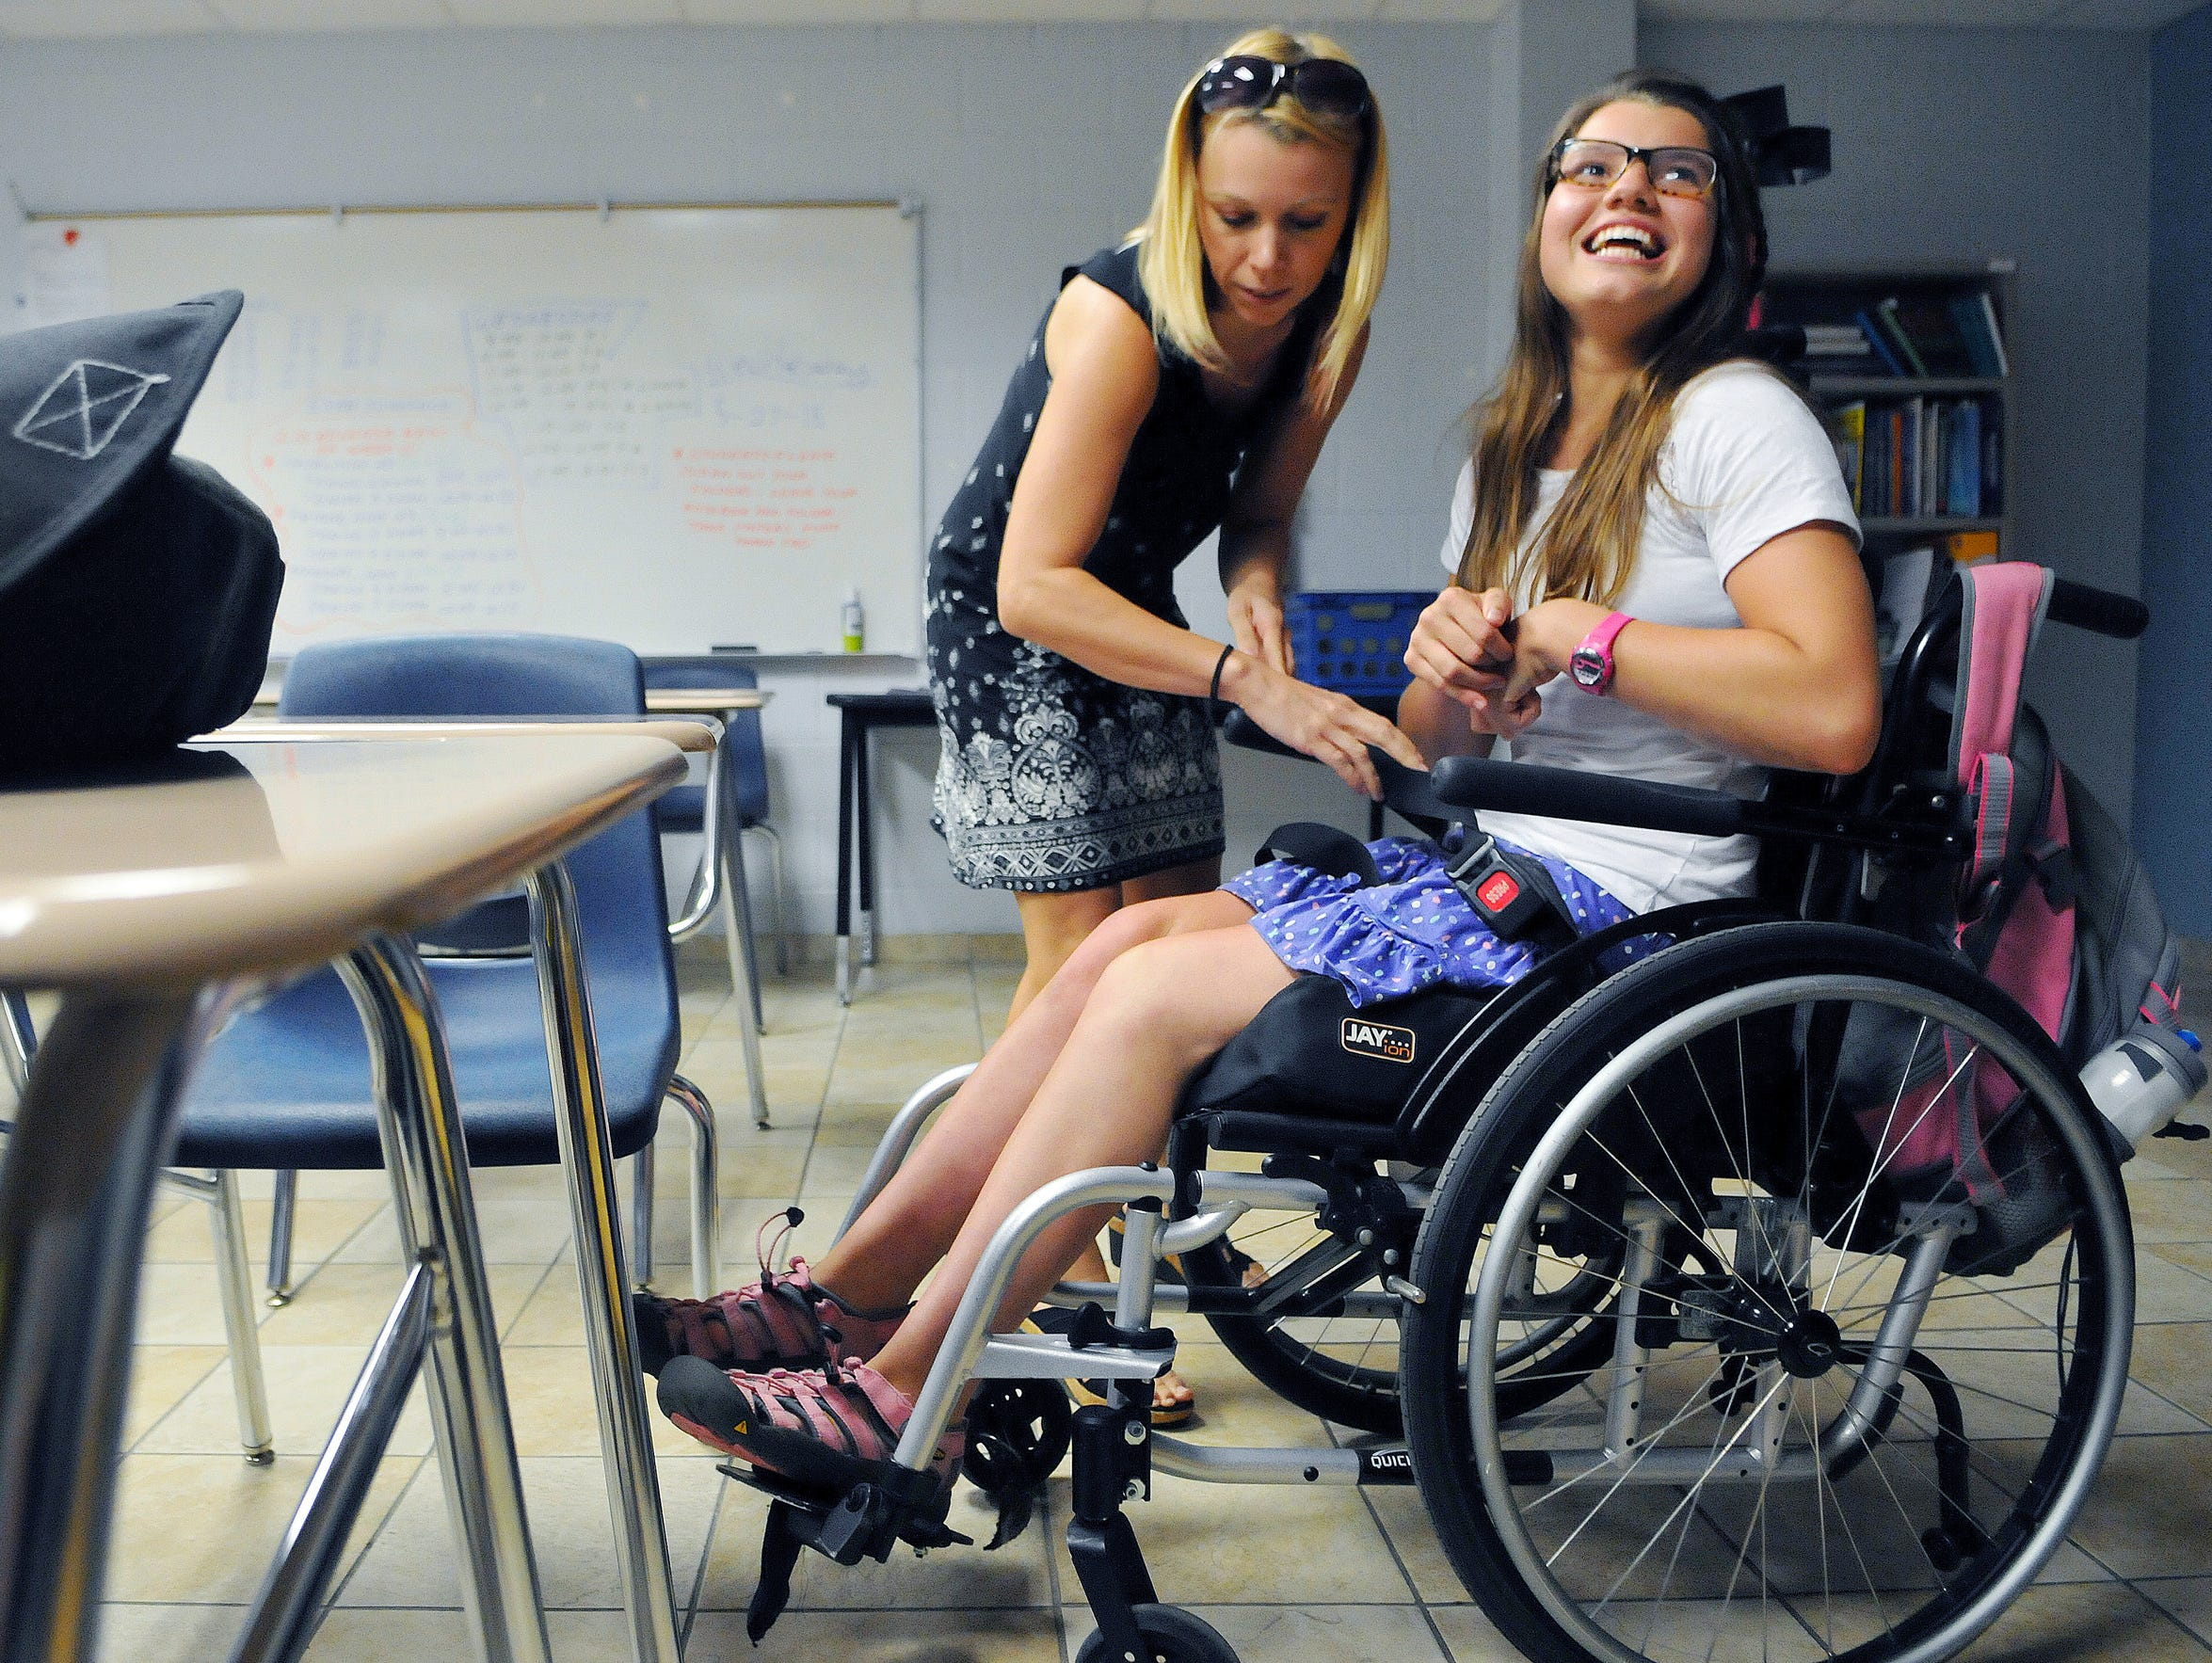 Jacqueline Eaton, an instructional assistant, helps